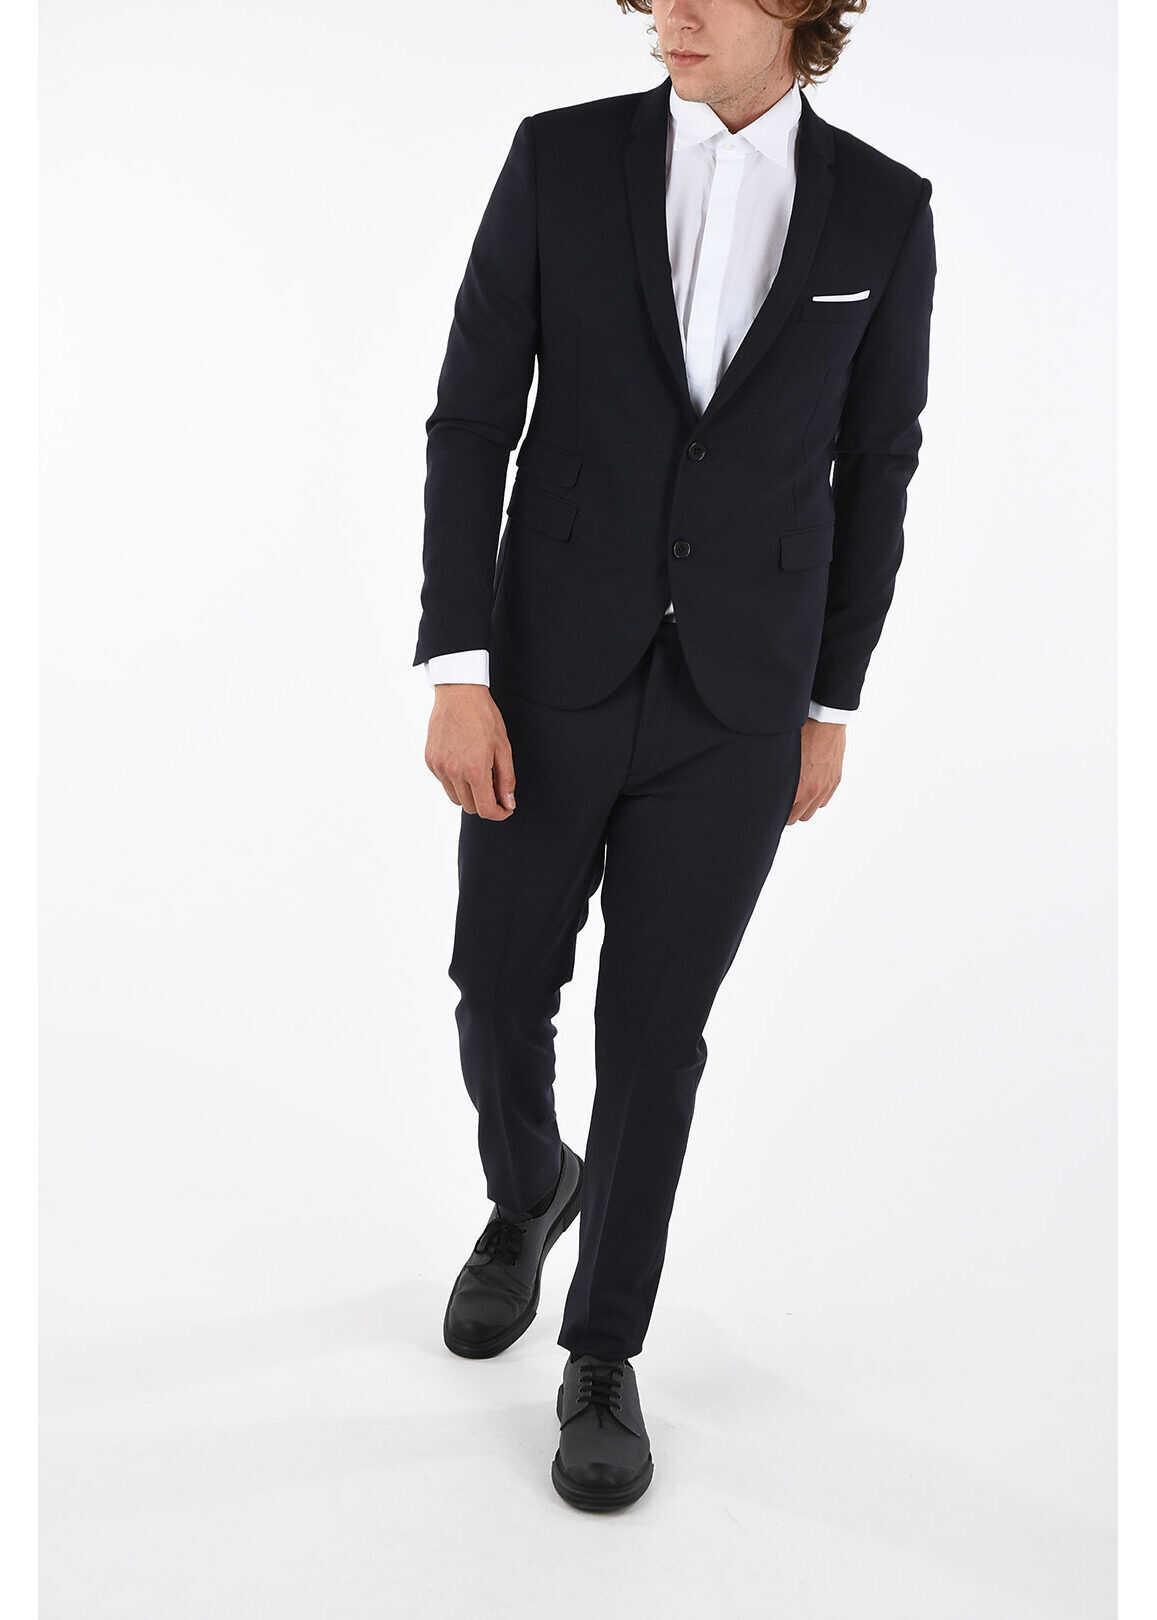 Neil Barrett Super Skinny Fit Suit BLUE imagine